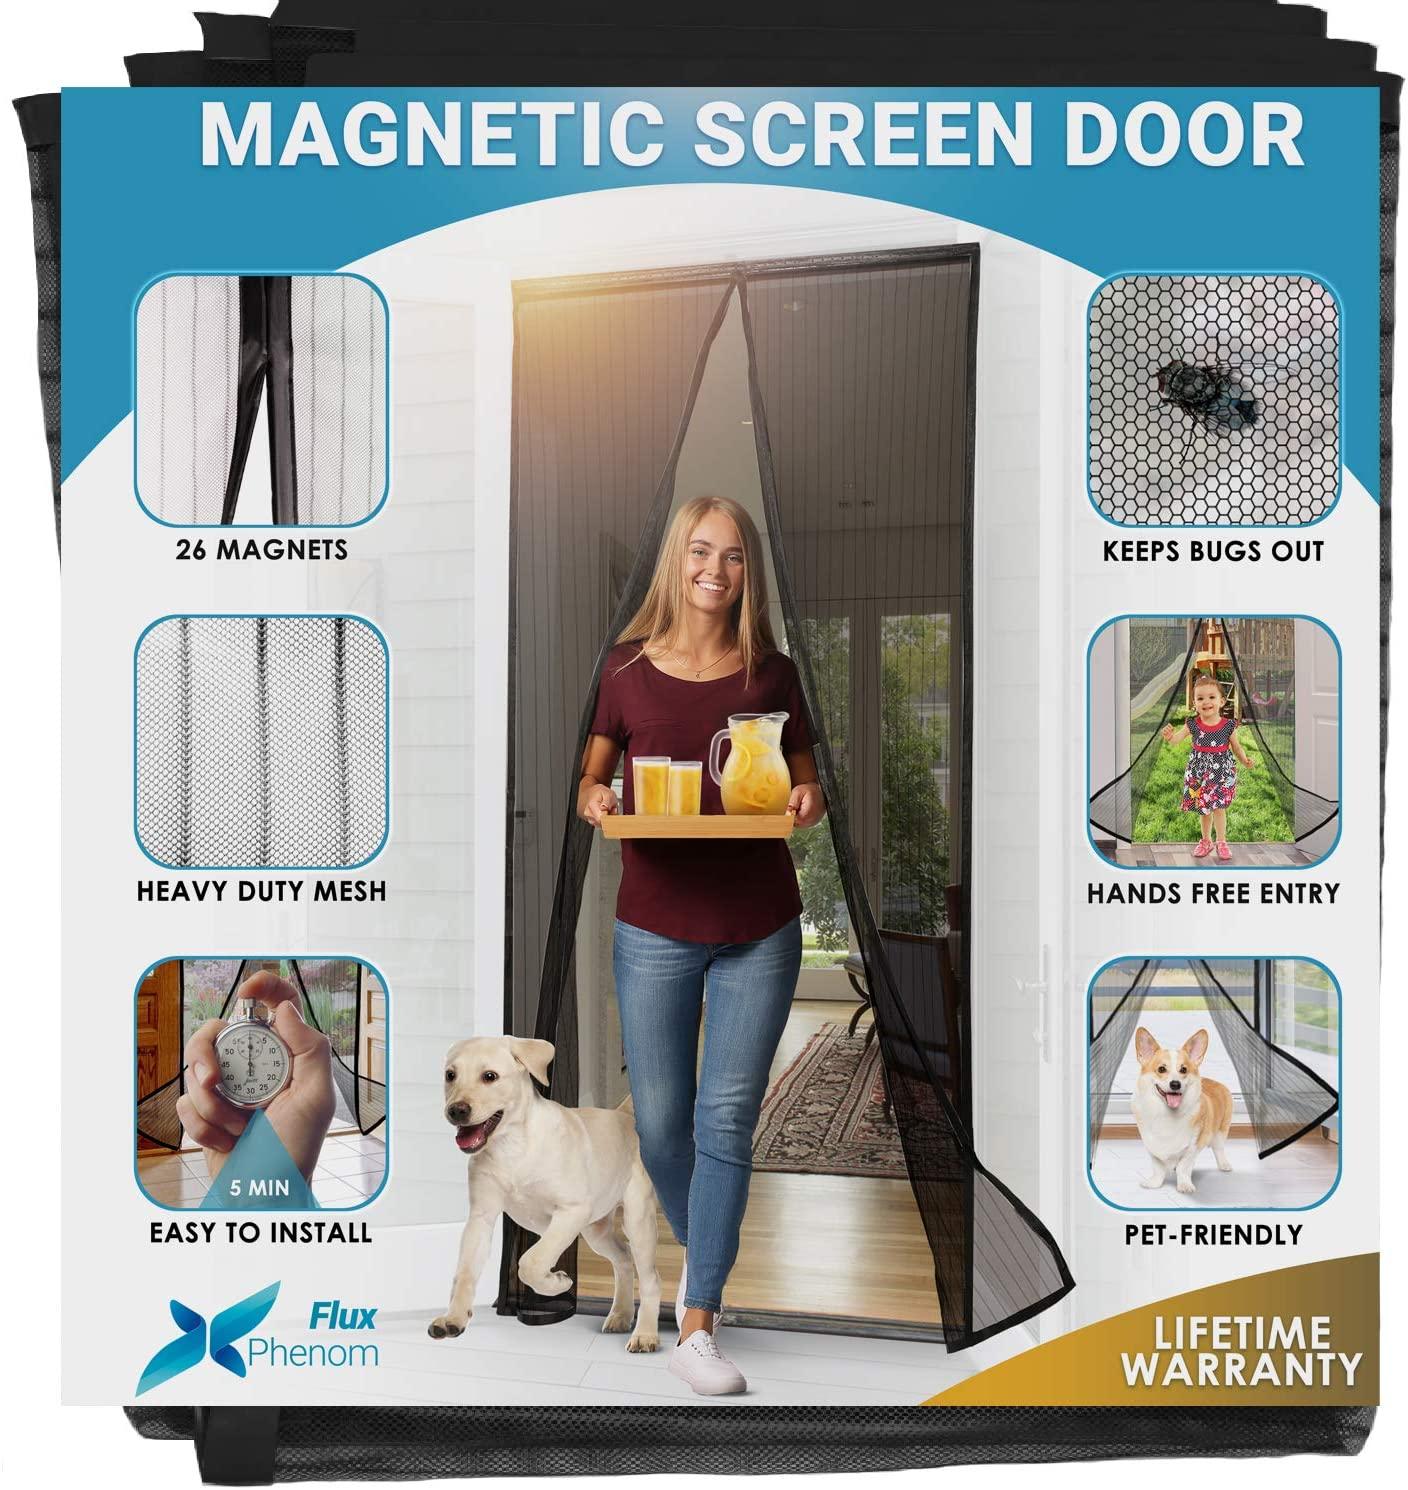 Top 7 Best Magnetic Screen Doors of 2020 – Reviews